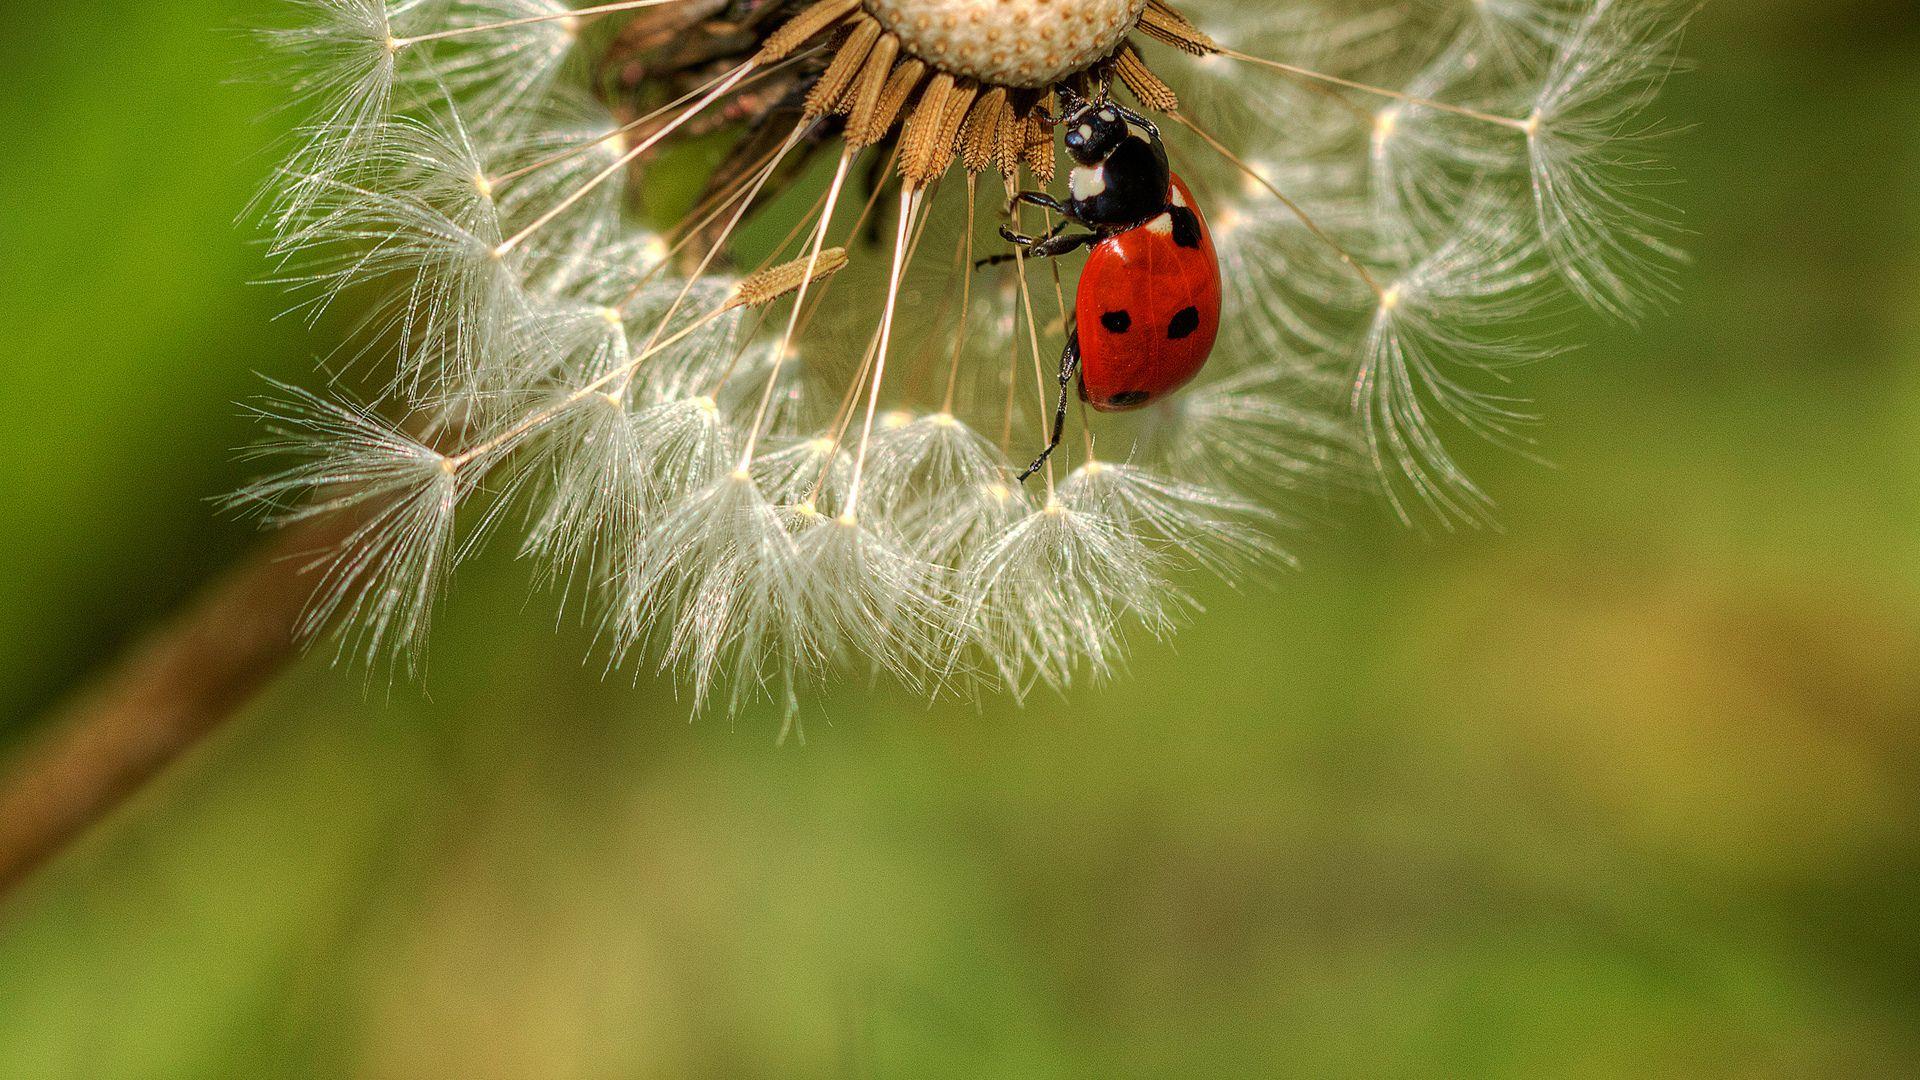 Dandelions Ladybugs Picture